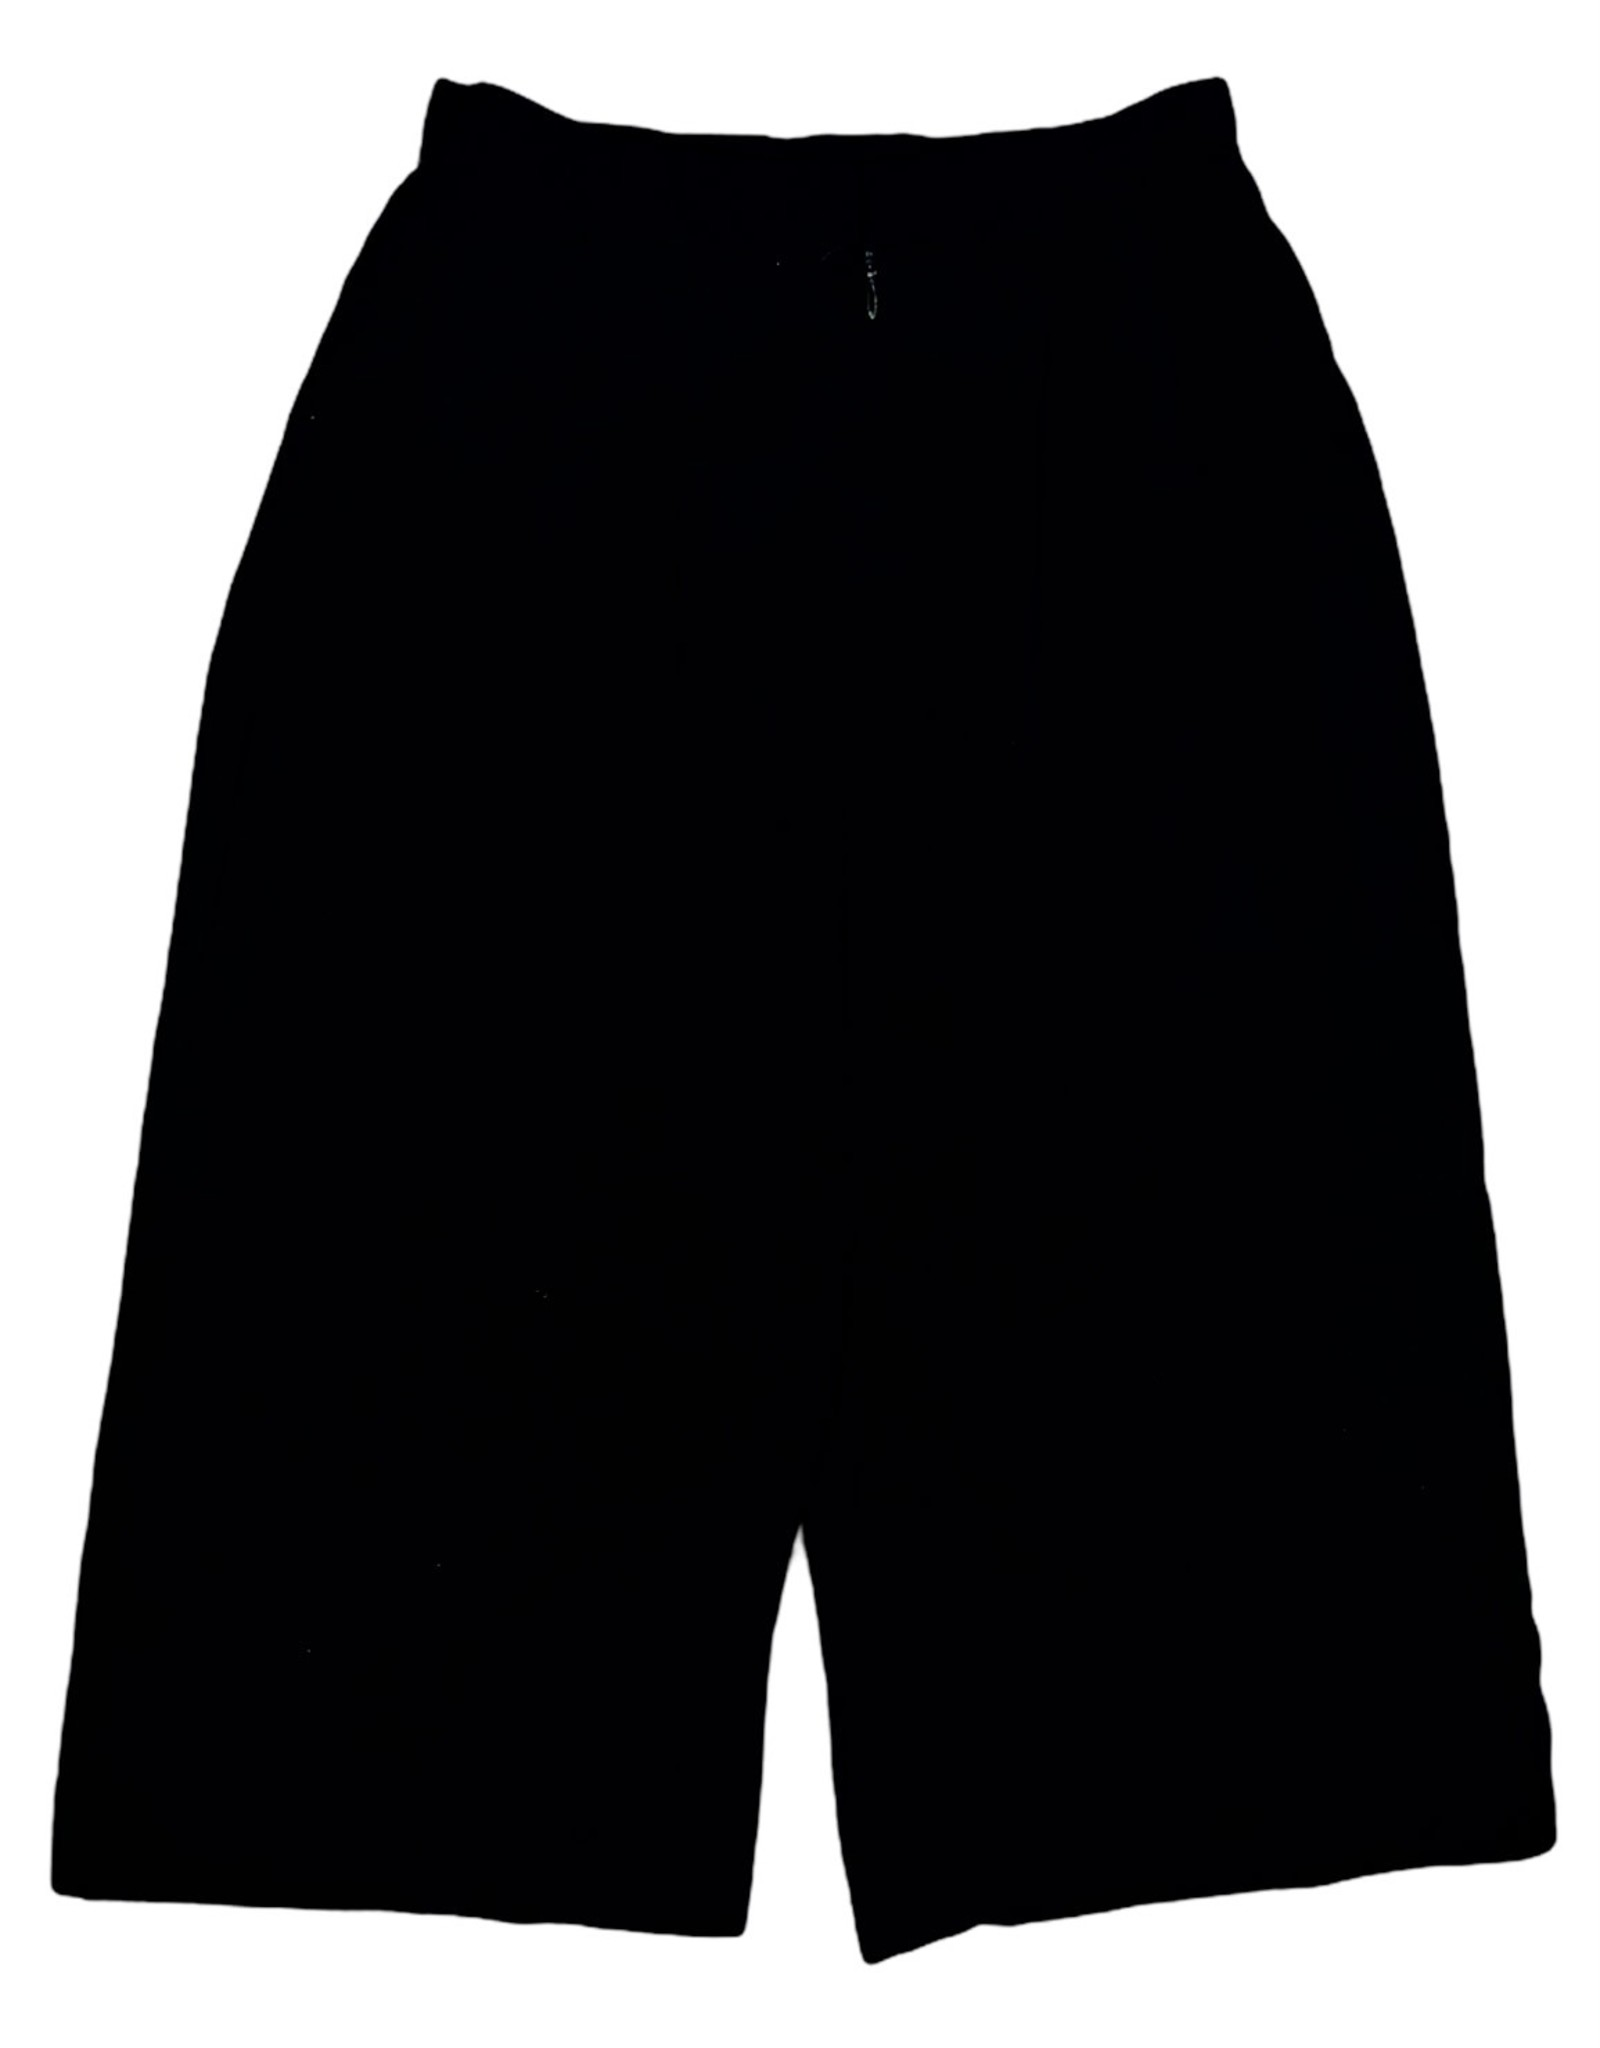 "Lloyd williams Lloyd williams 90s black skirt 26"" waist"